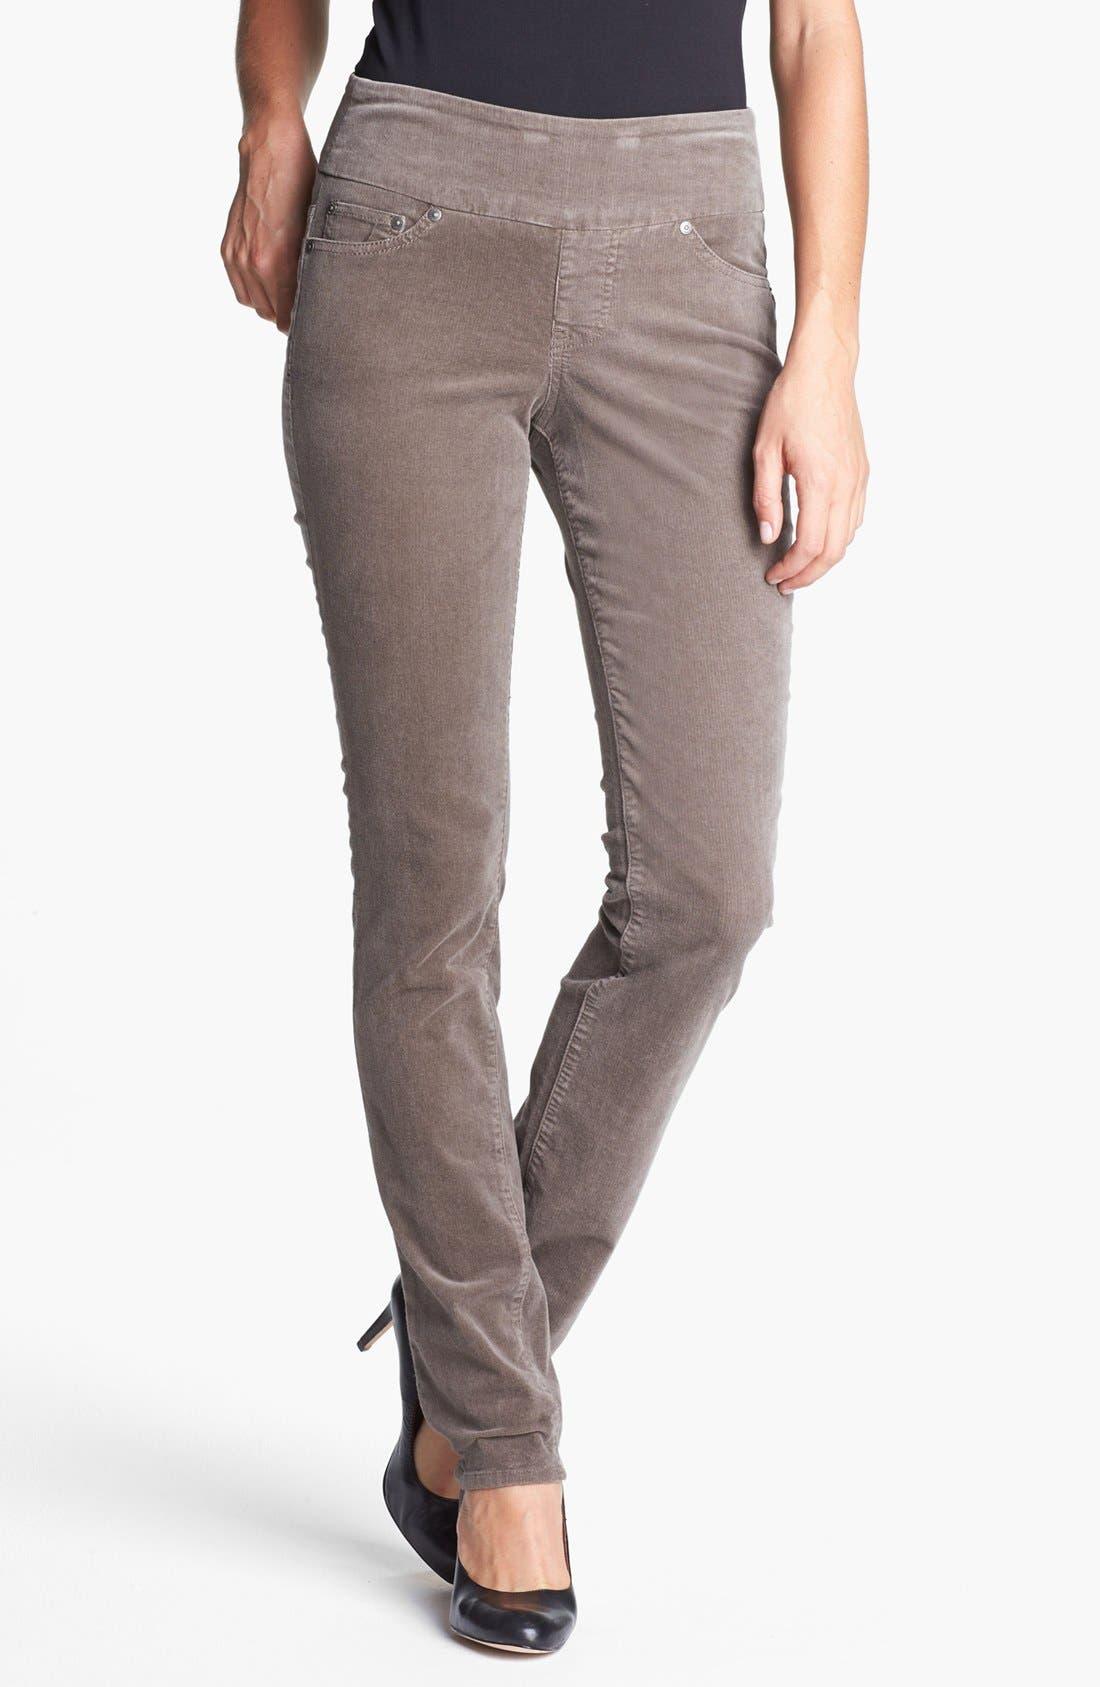 Alternate Image 1 Selected - Jag Jeans 'Peri' Straight Leg Corduroy Pants (Petite)